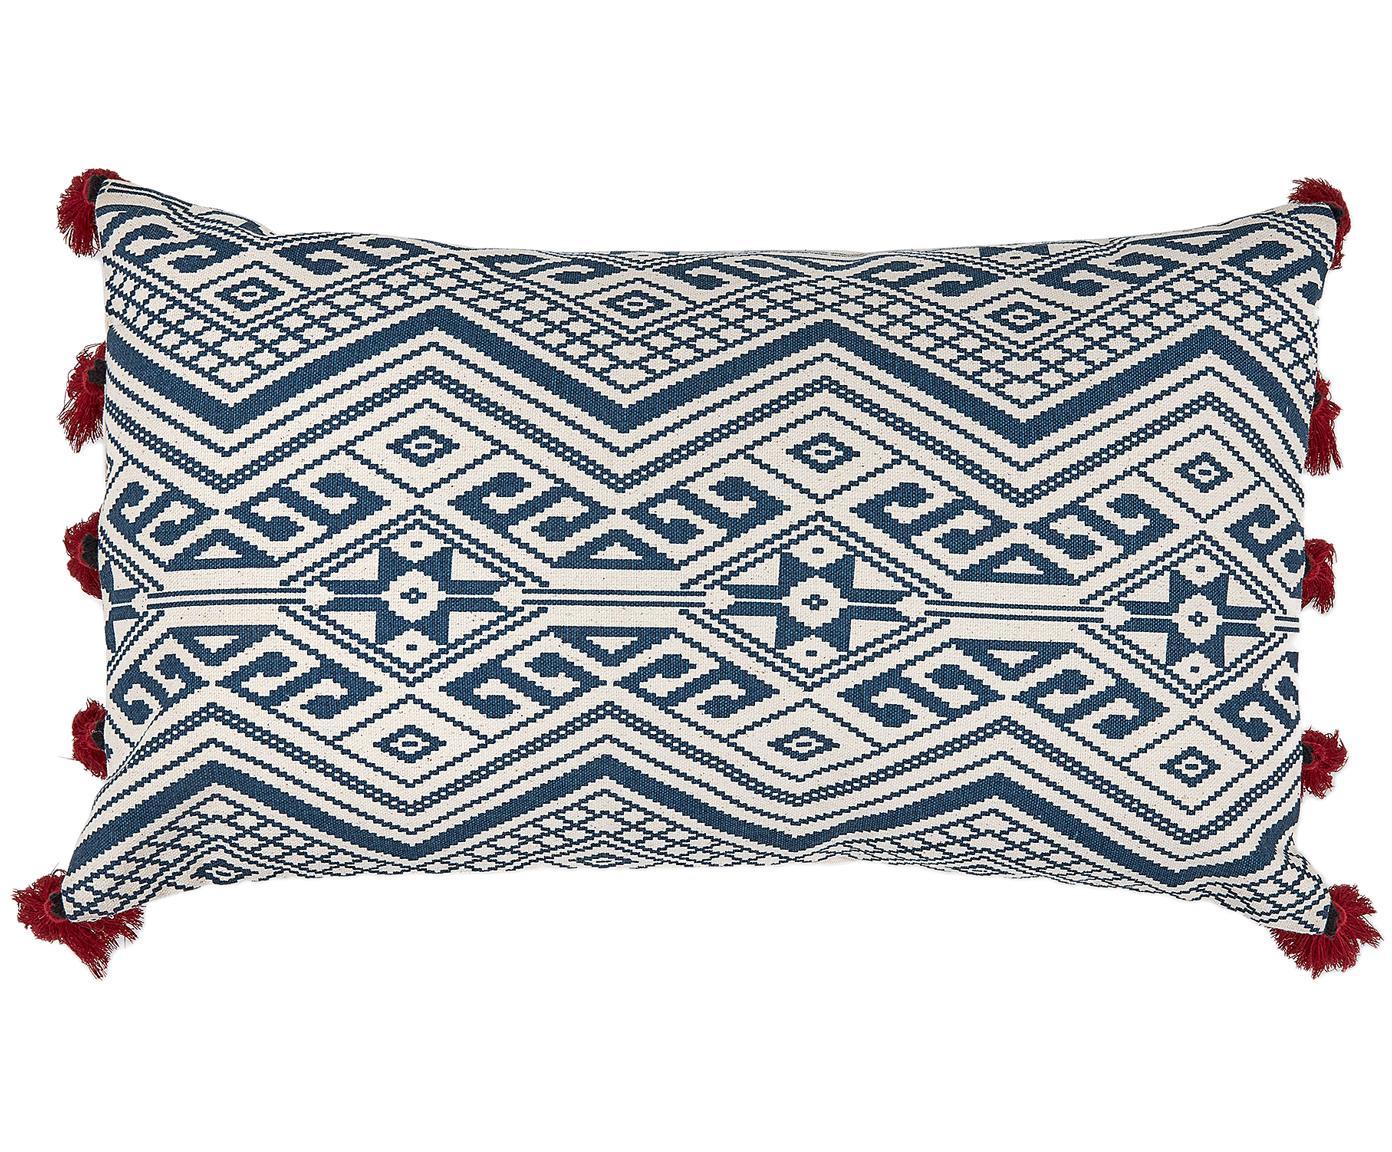 Kissenhülle Cerys, 100% Baumwolle, Blau, Rot, Creme, 30 x 50 cm